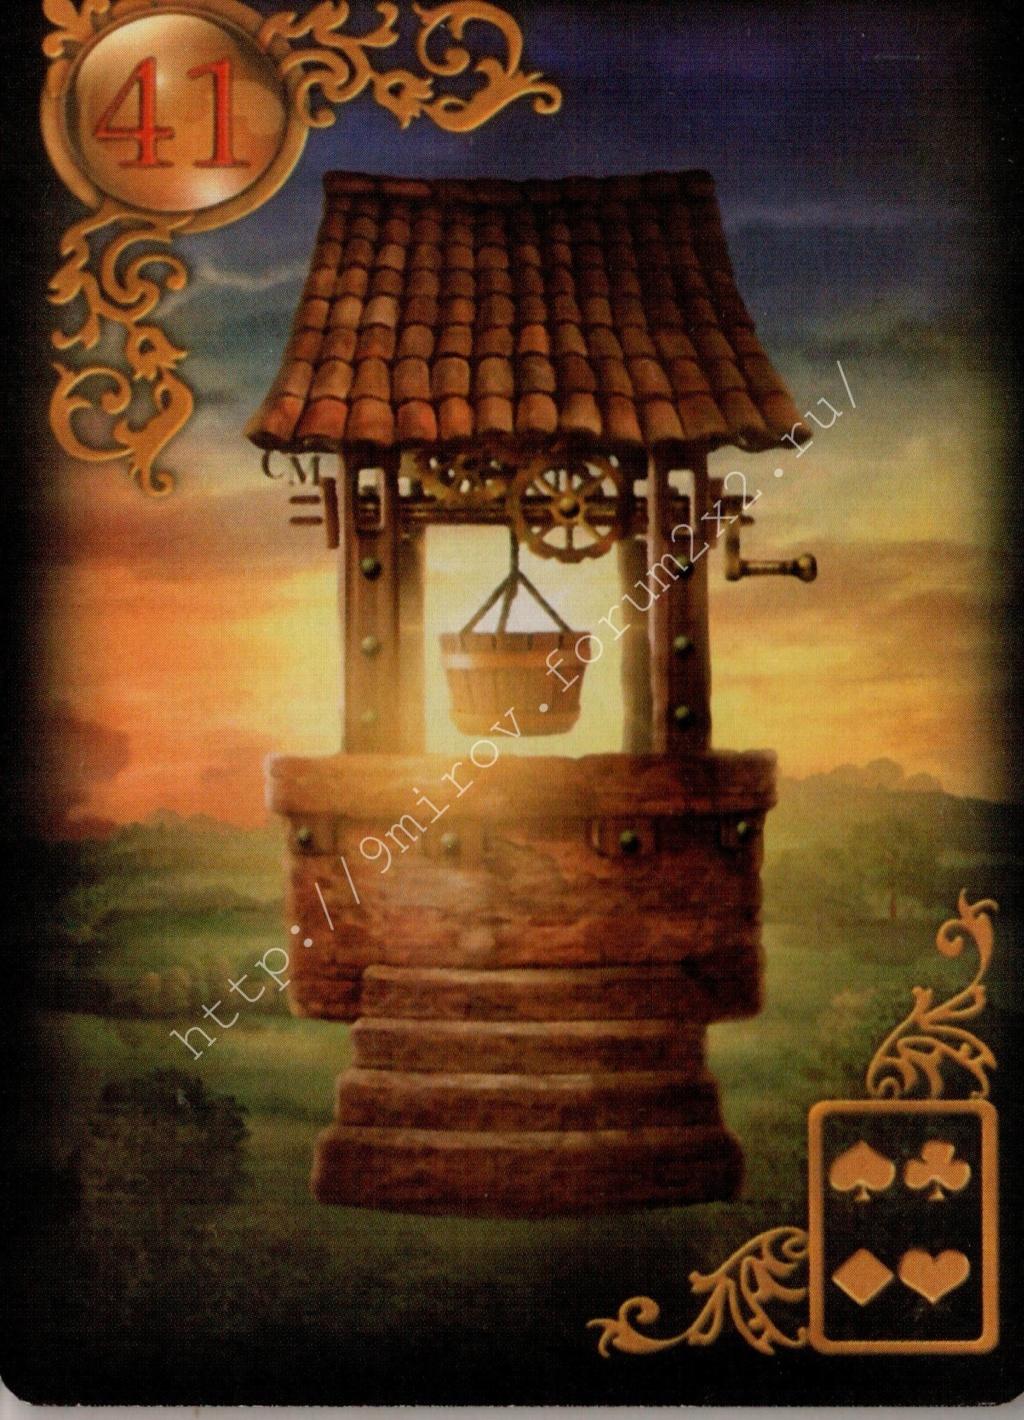 Золотые мечты Ленорман (Расширенное издание) | Gilded Reverie Lenormand. Галерея.  Water131